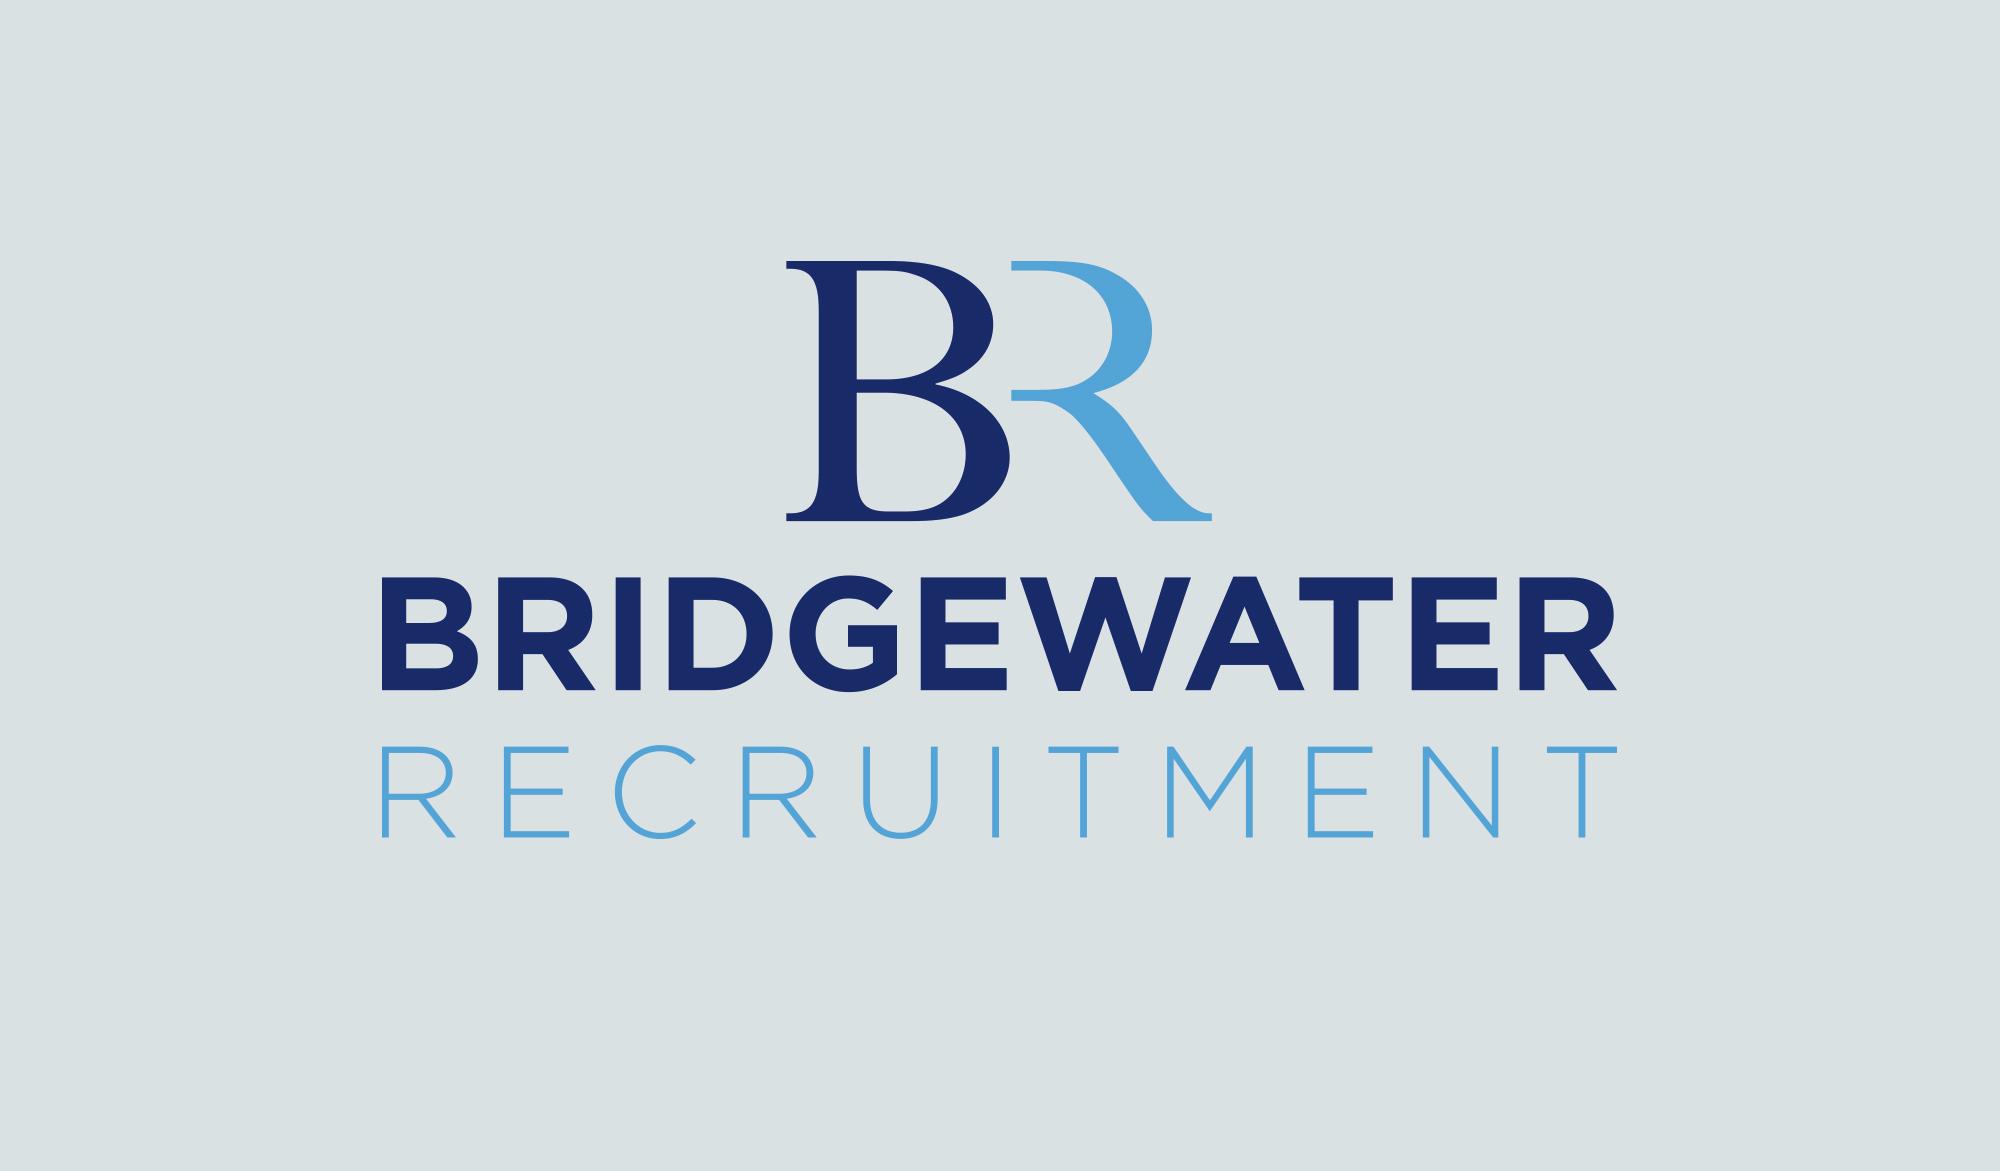 Bridgewater Recruitment Logo